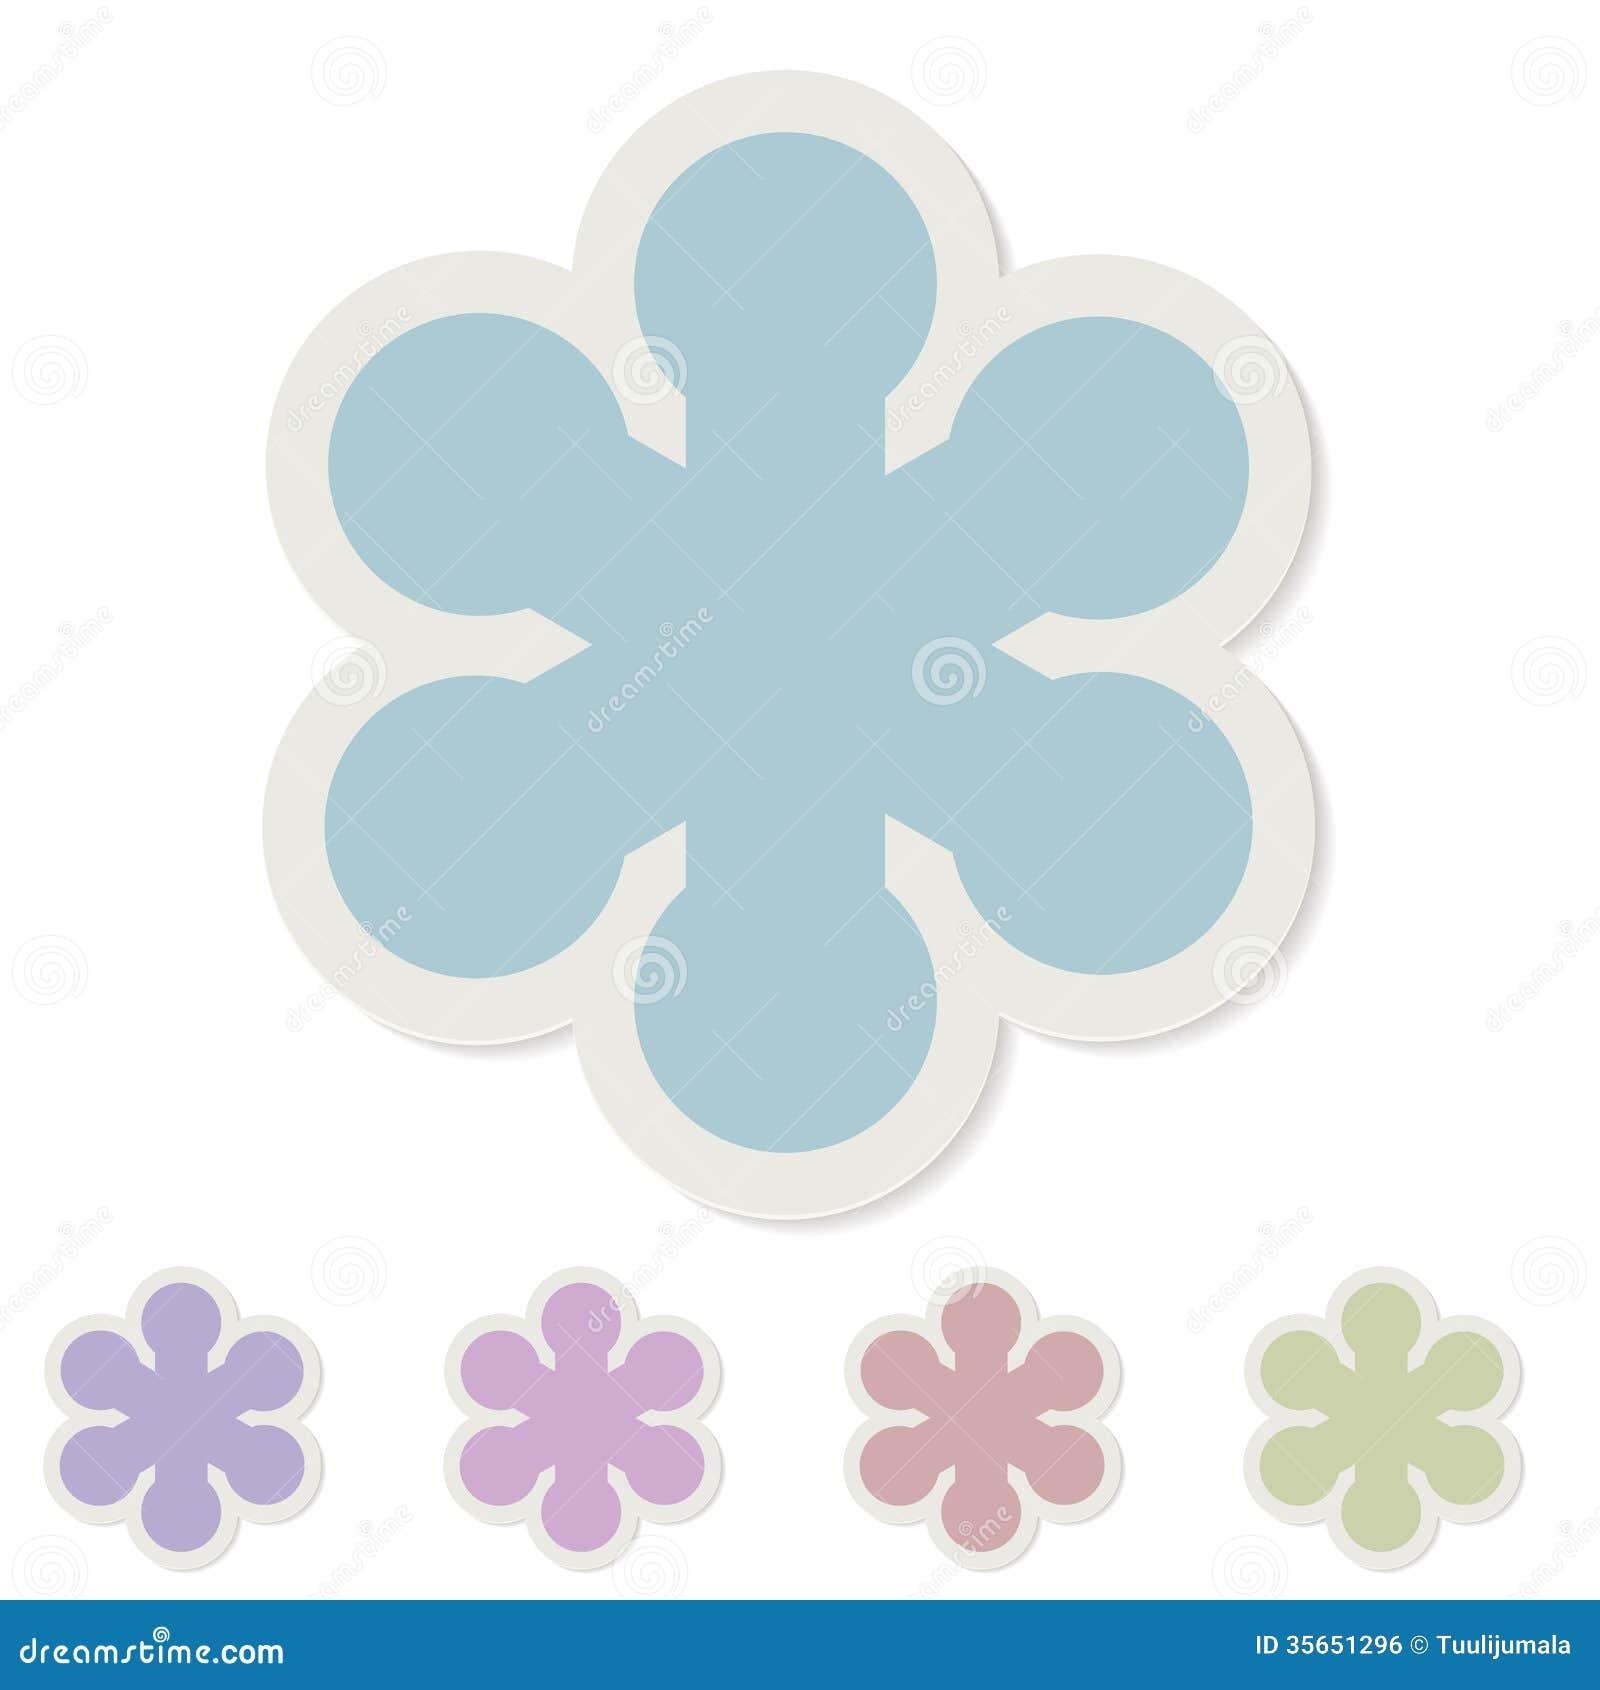 Snowflake Paper Sticker Royalty Free Stock Image - Image: 35651296